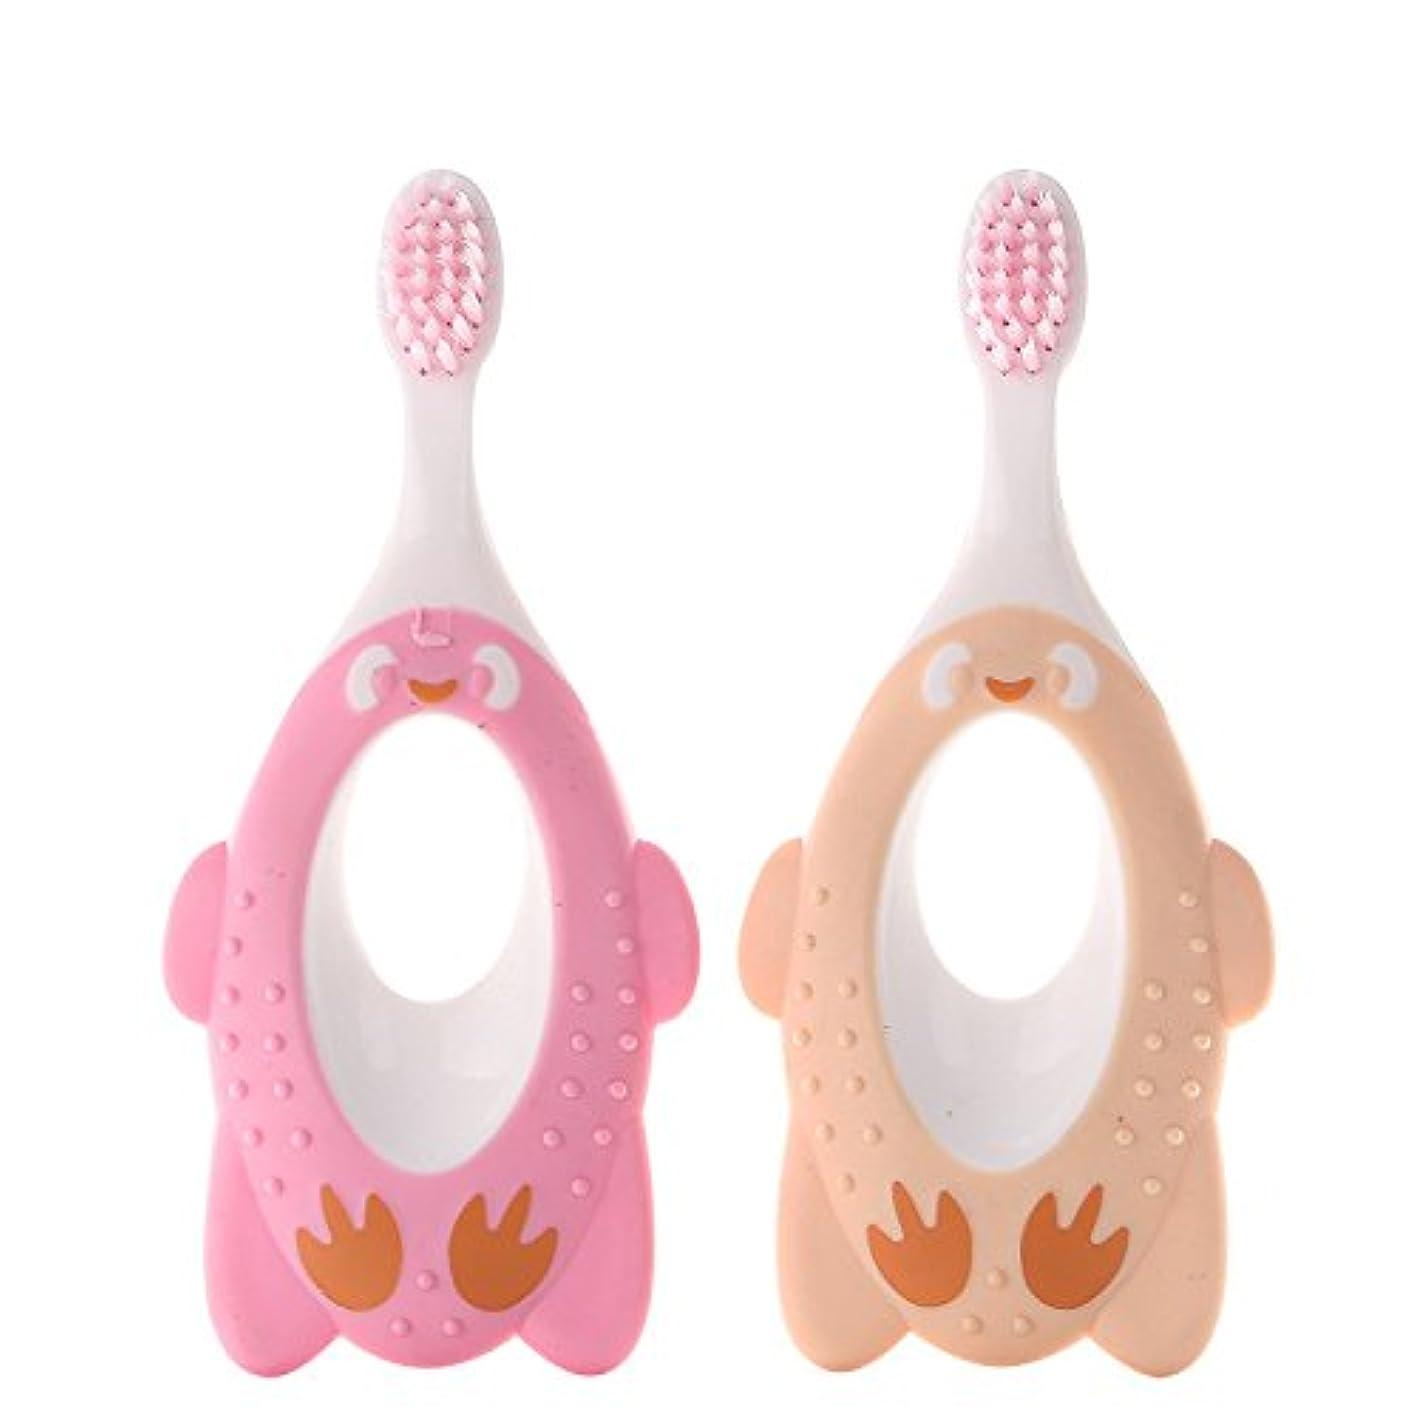 Liebeye 赤ちゃん 歯ブラシ かわいい漫画 柔らかい毛の口腔ケア ツール 練習 歯ブラシ ランダムな色